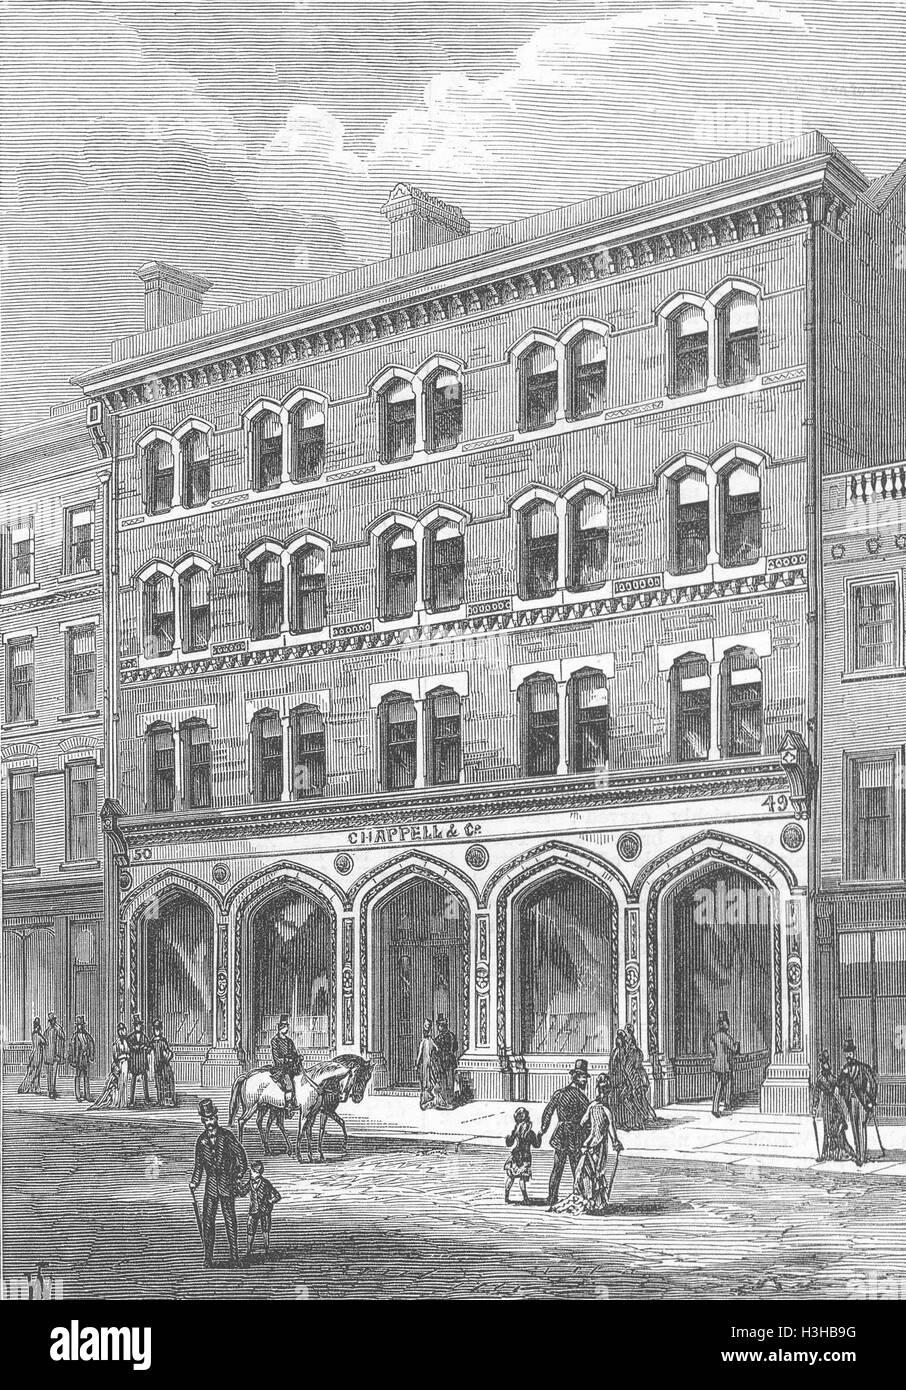 BOND ST Chappell & Co 's Premises, new 1878. Illustrated London News - Stock Image